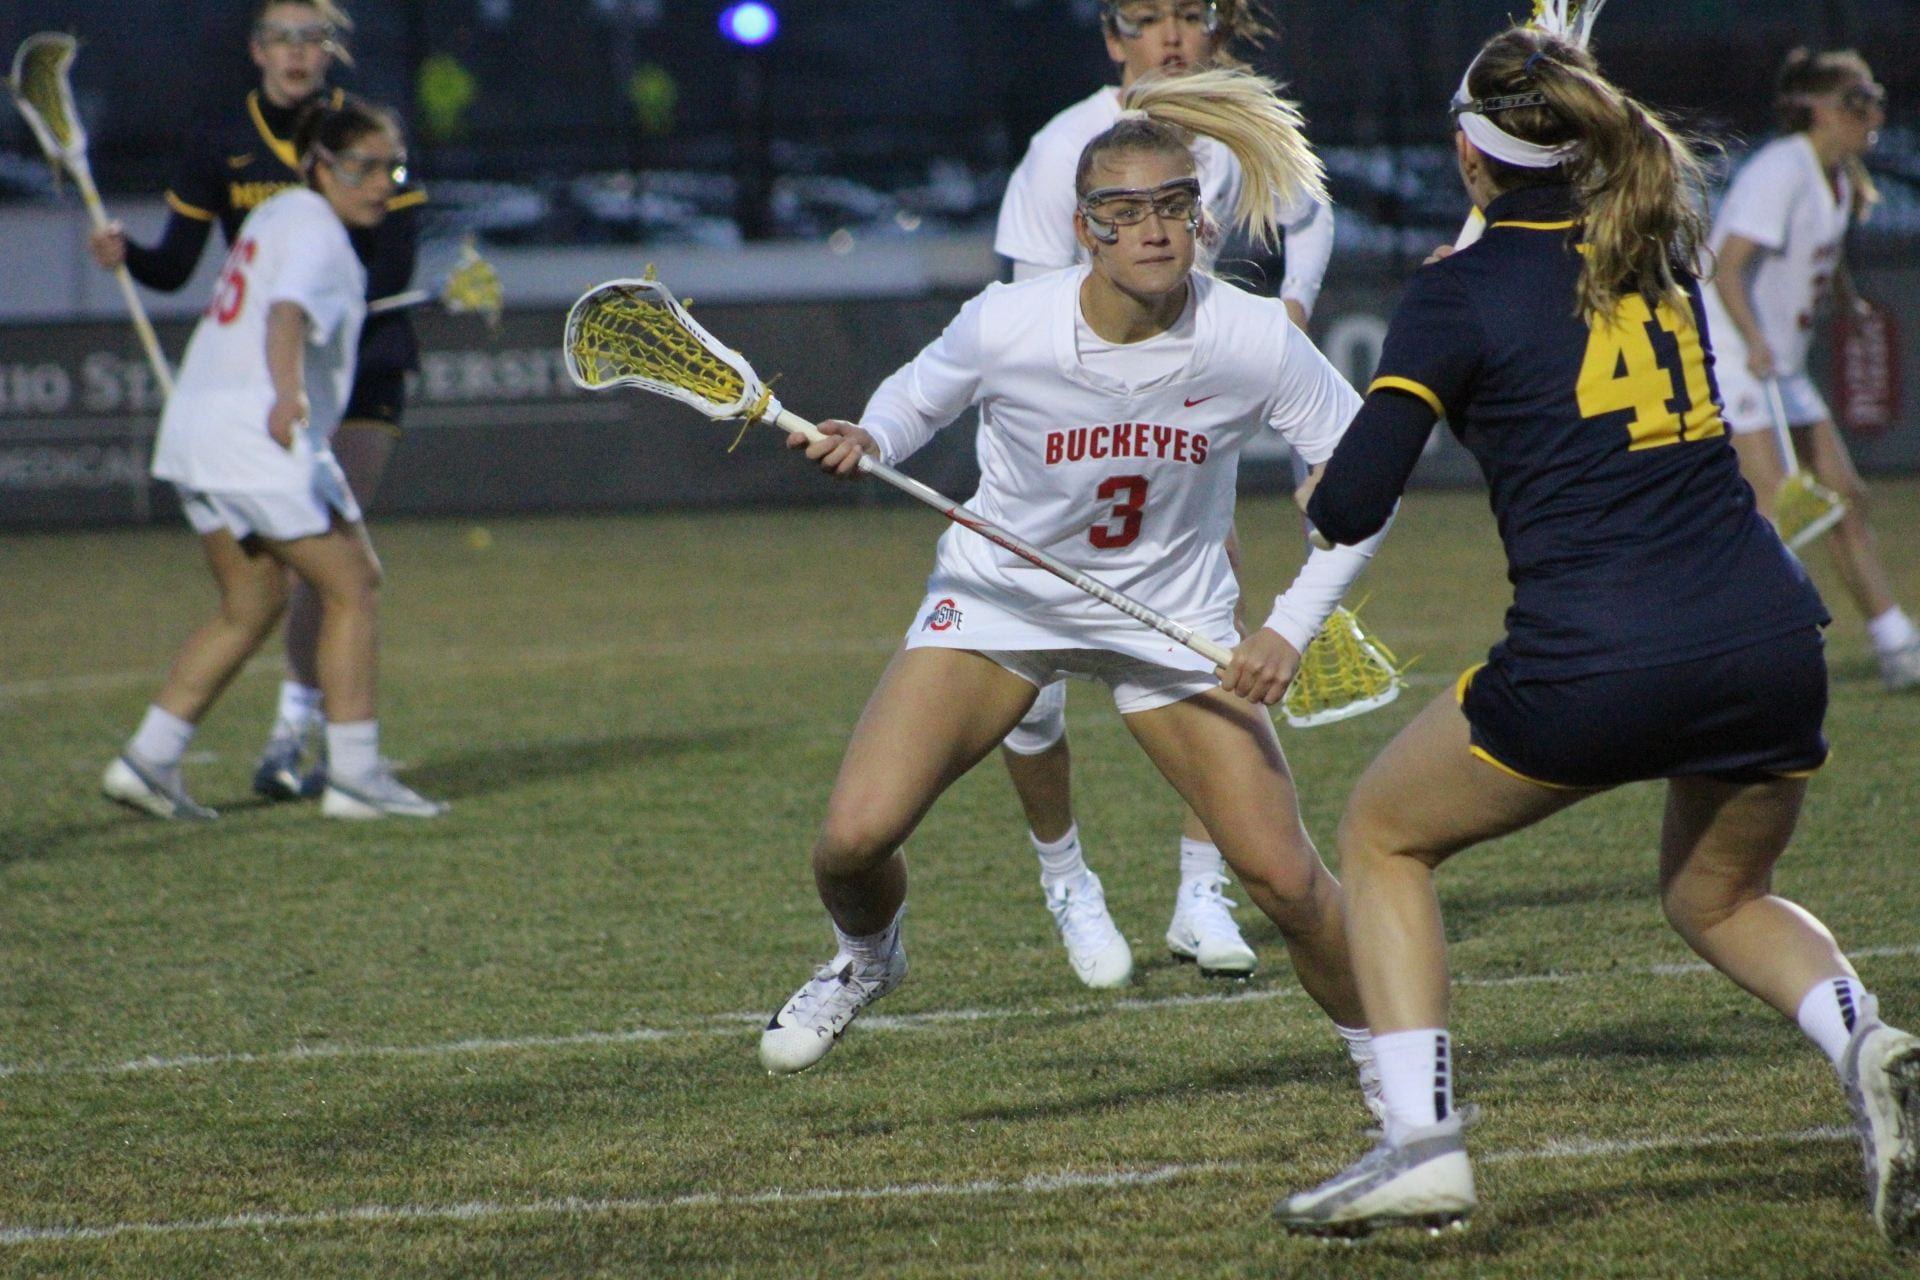 Women's Lacrosse: Ohio State defeats Robert Morris 13-8